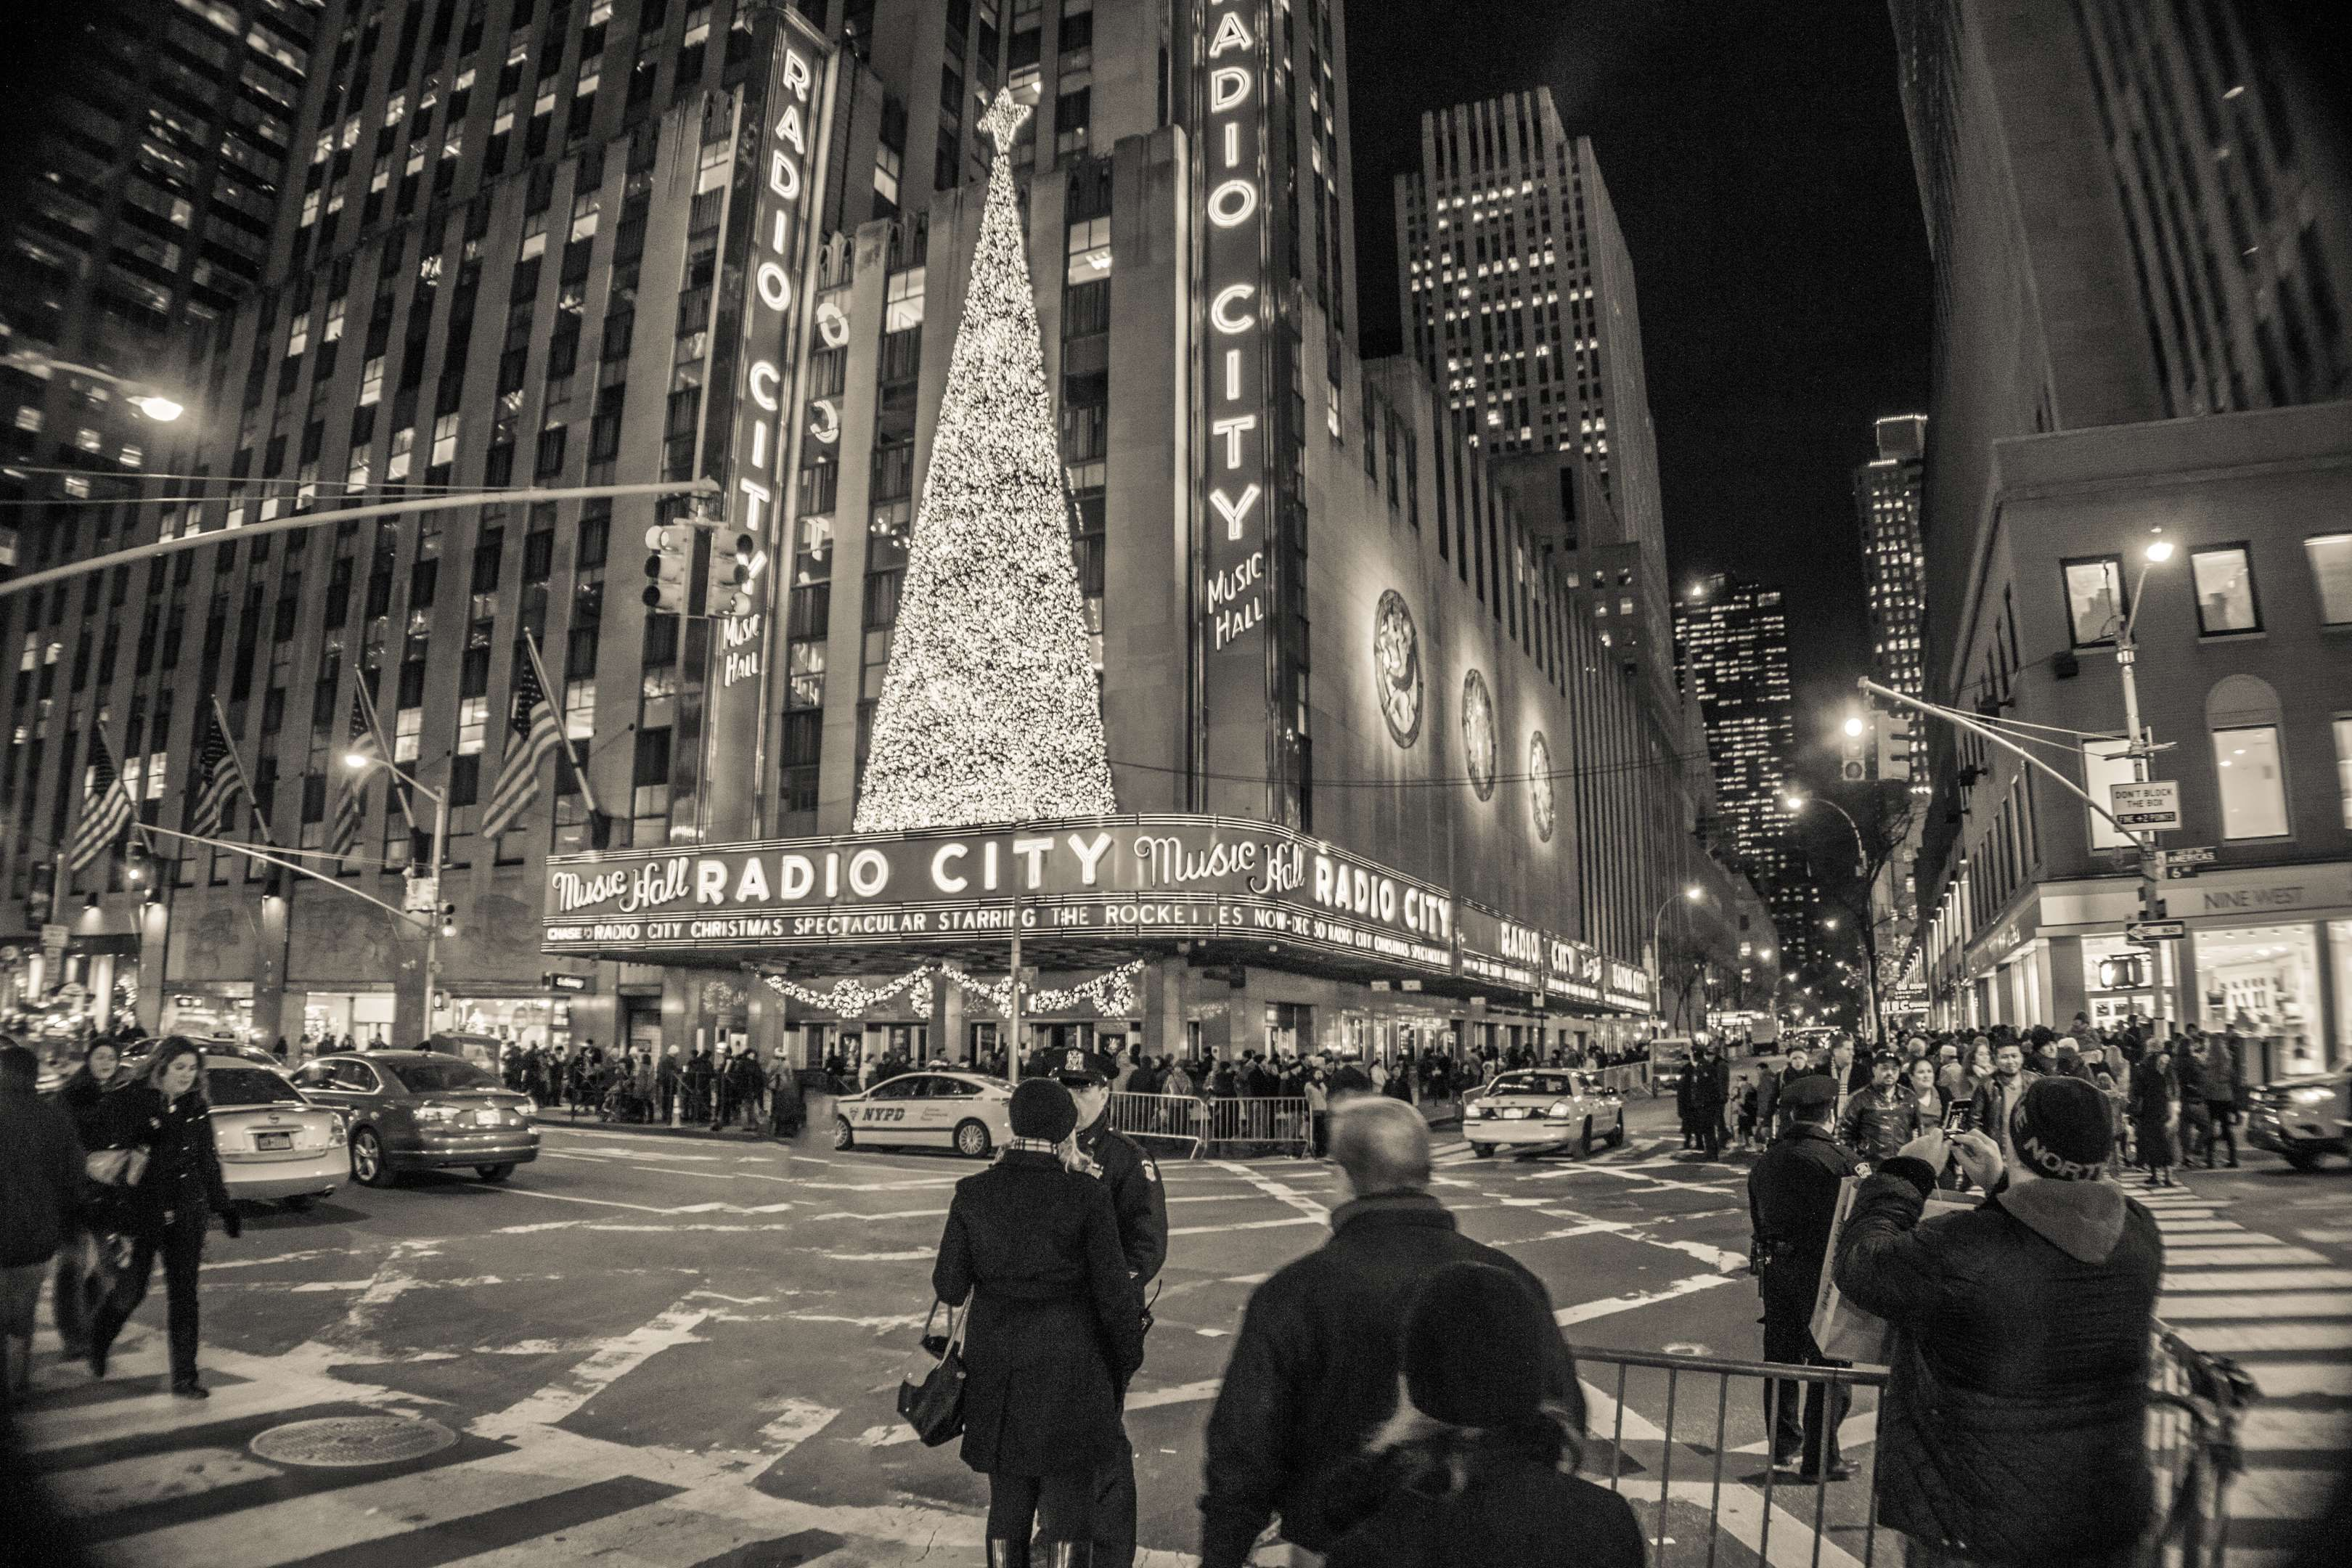 Radio City Music Hall At Night Nyc New York City Poster By Jkwartwork New York Night City Aesthetic New York Life